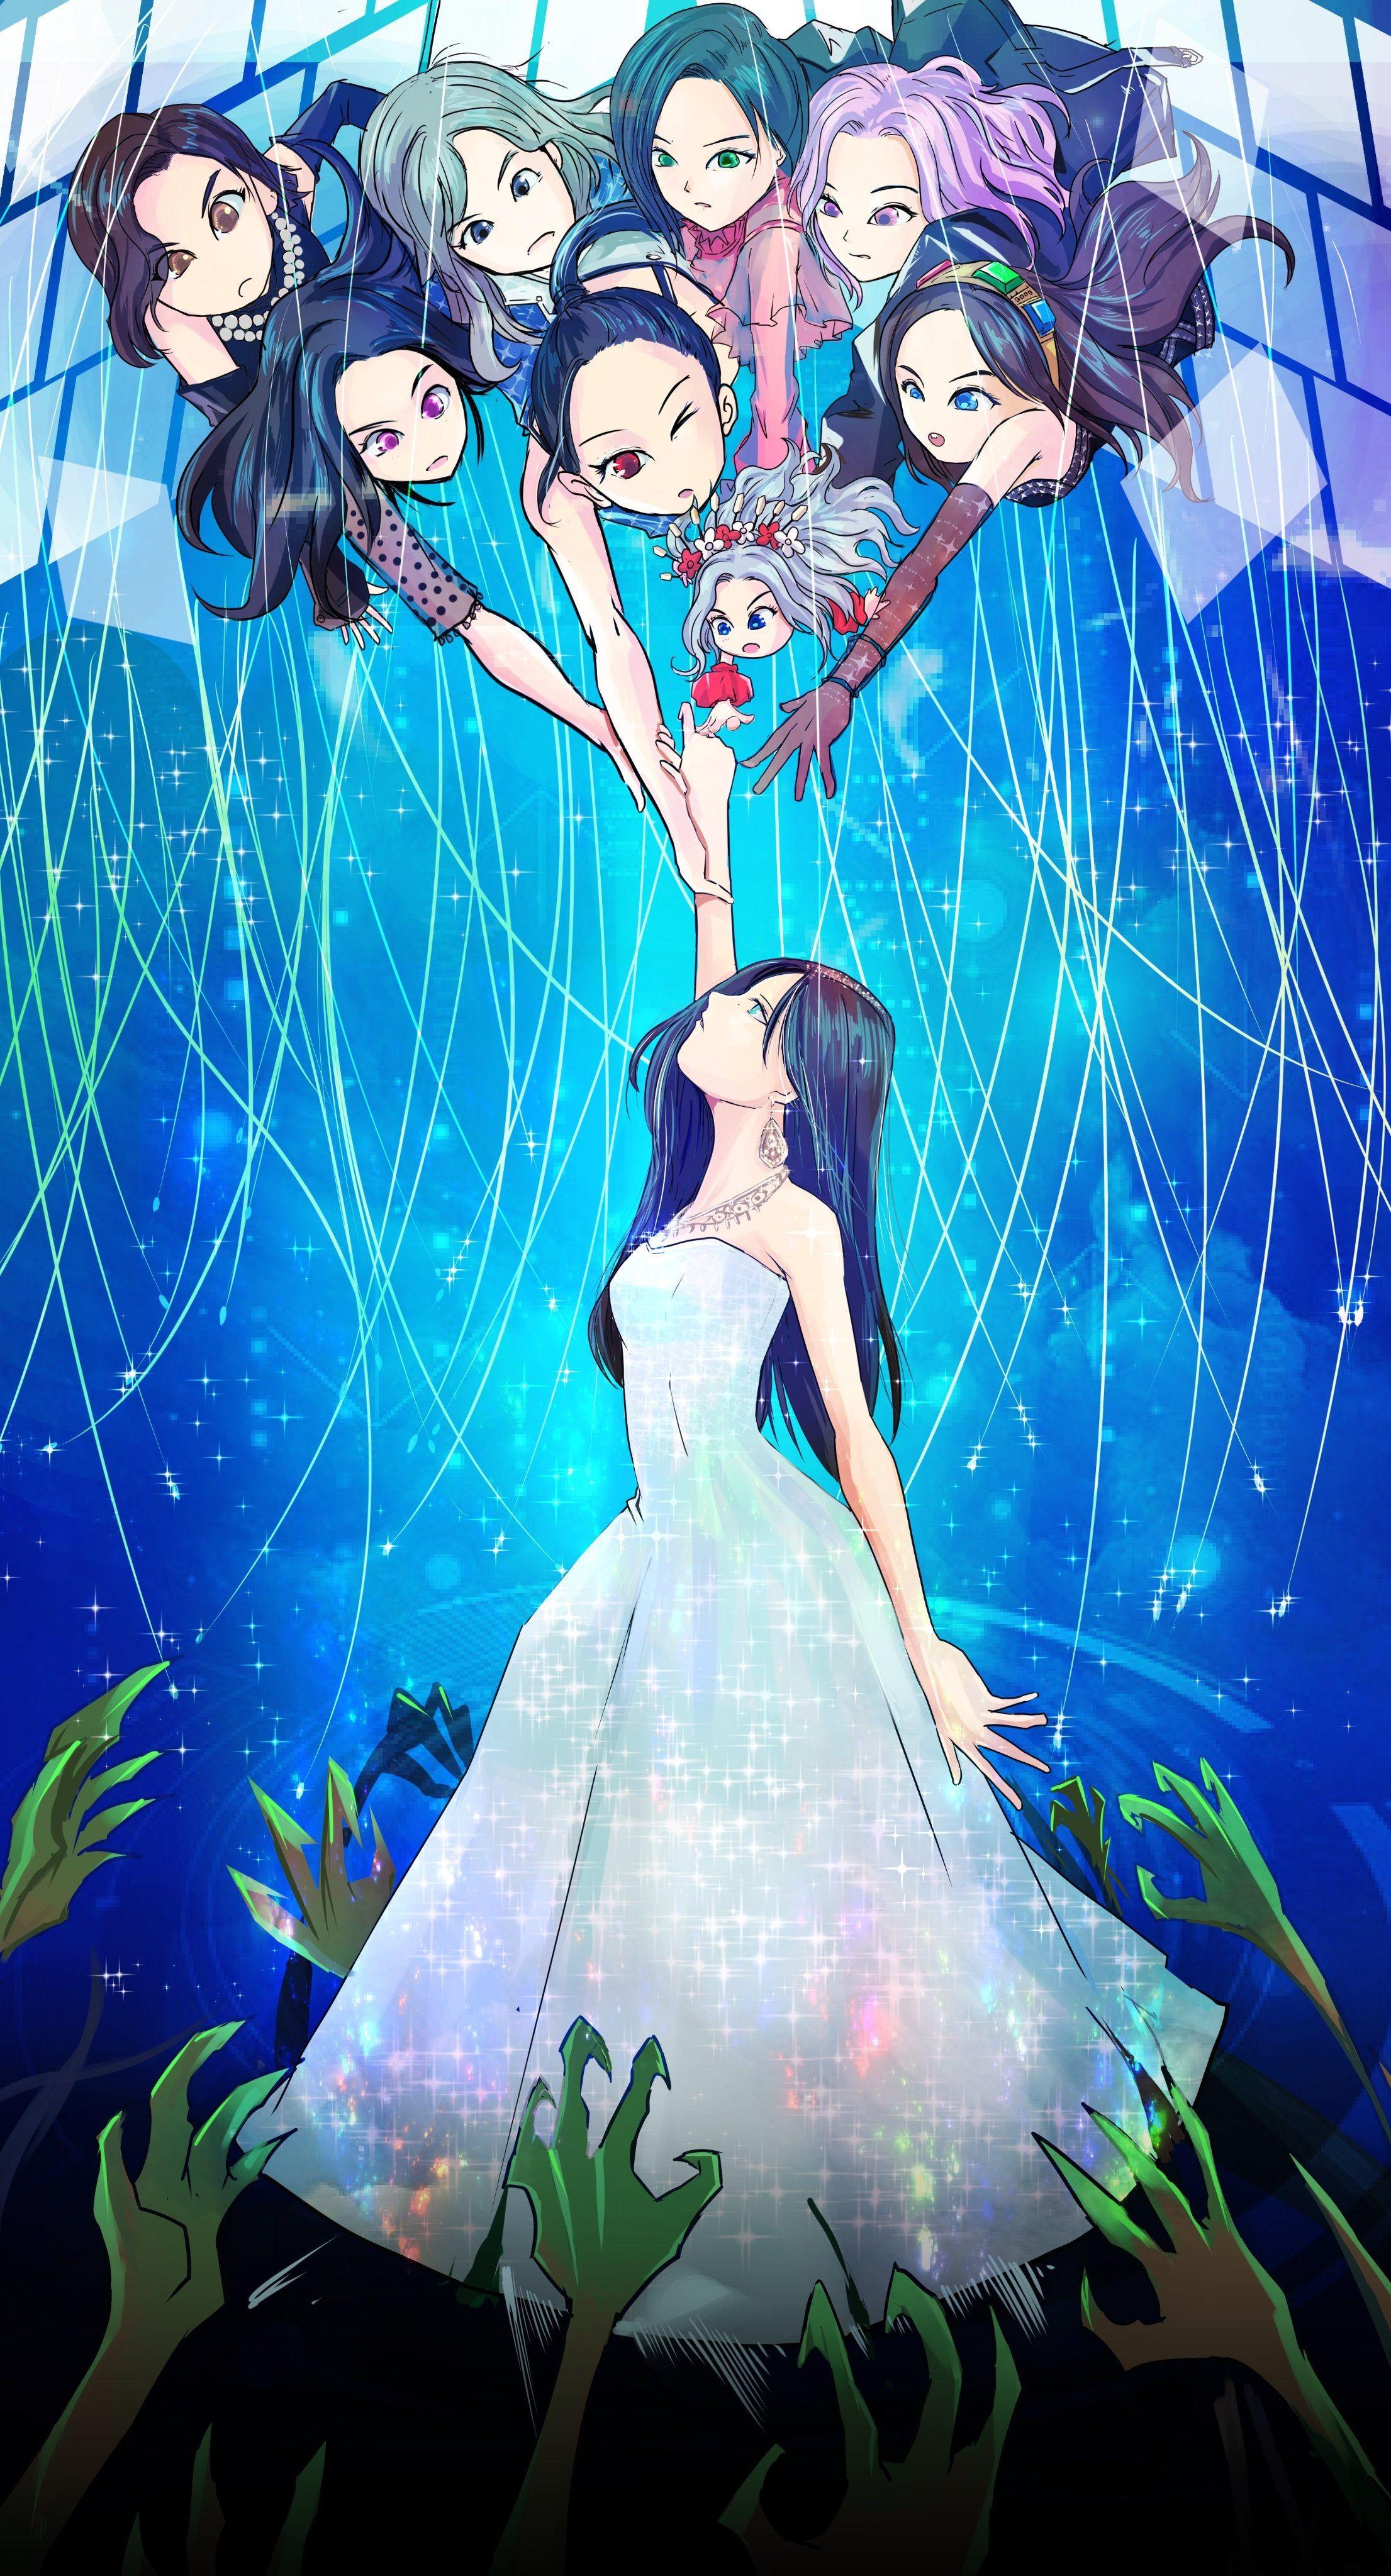 R Twice Credit Uodo0312 On Twitter Kpop Wallpaper Cute Anime Wallpaper Aesthetic Anime